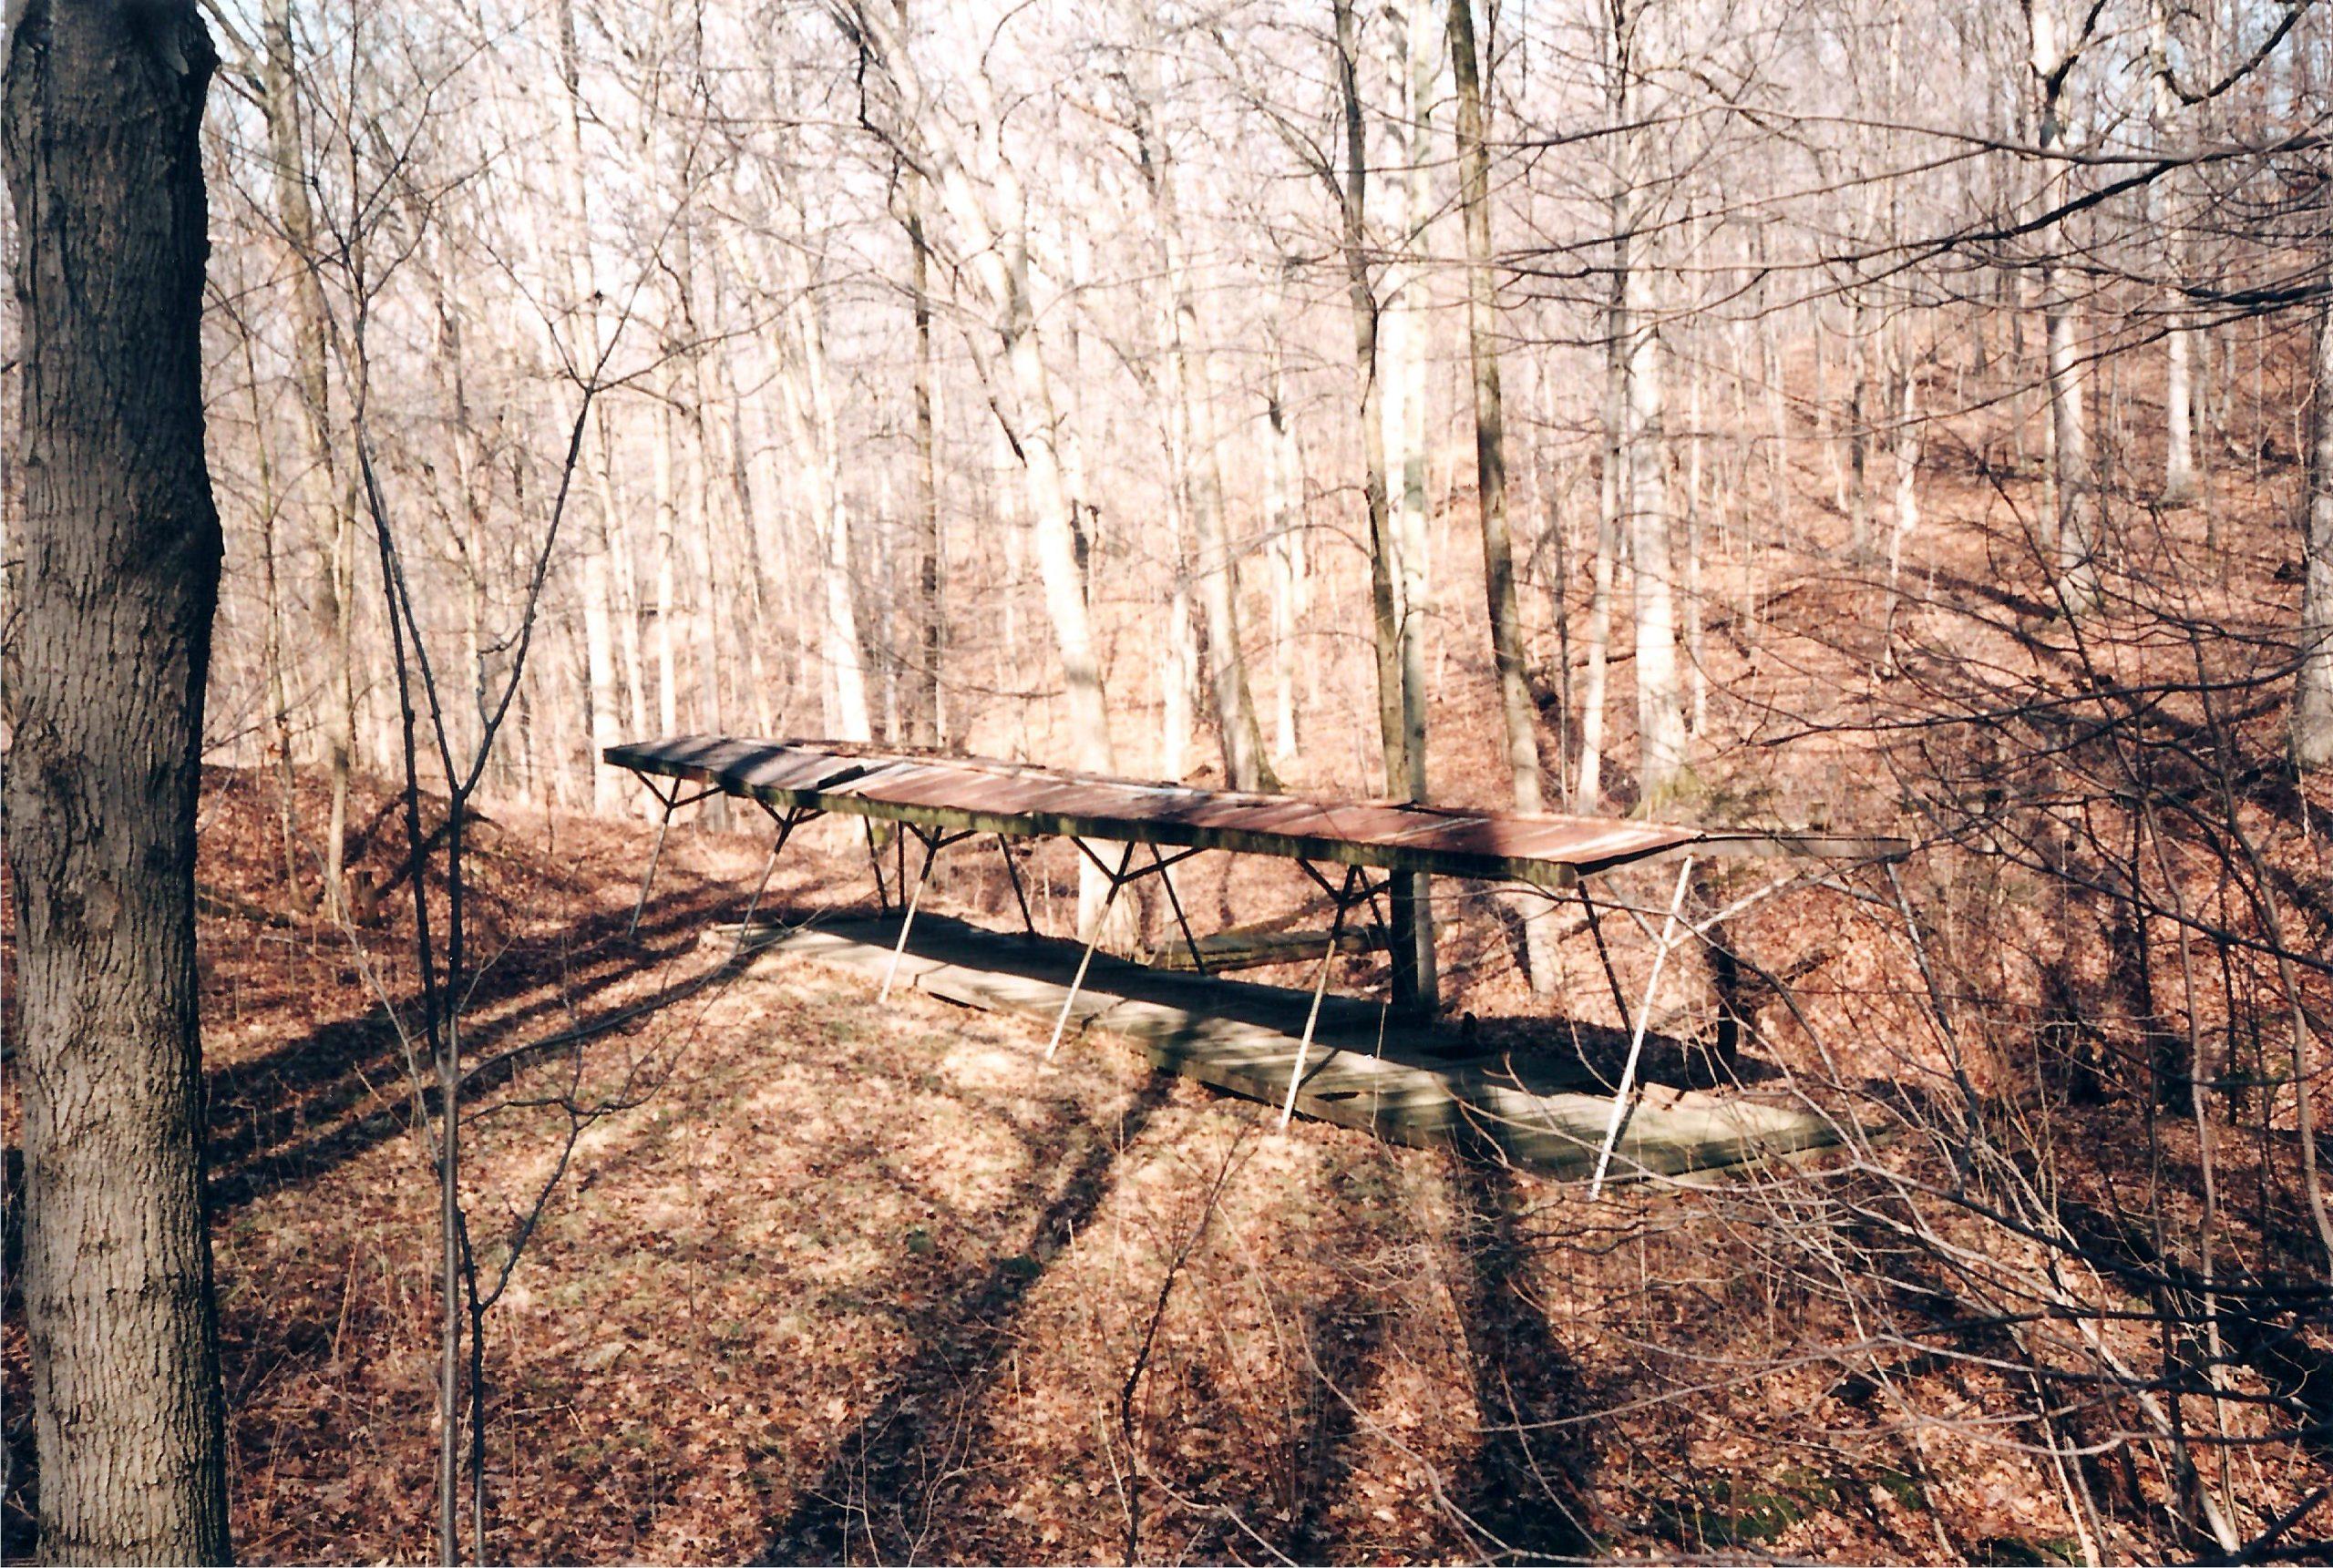 Rifle range in 1994